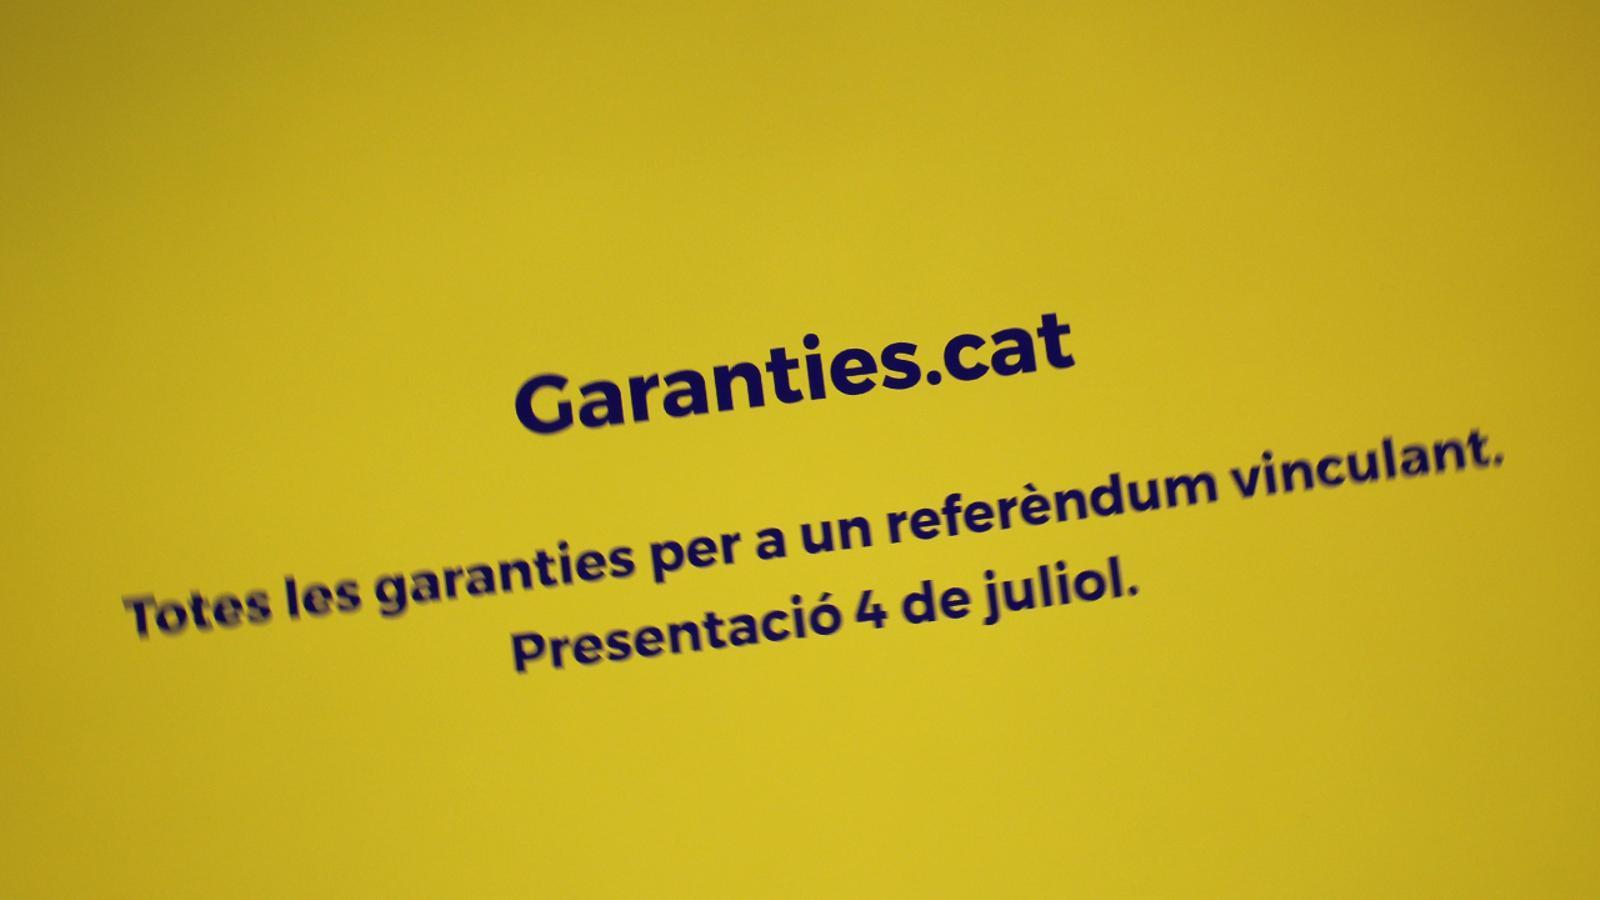 L'anàlisi d'Antoni Bassas: 'Voleu garanties?'